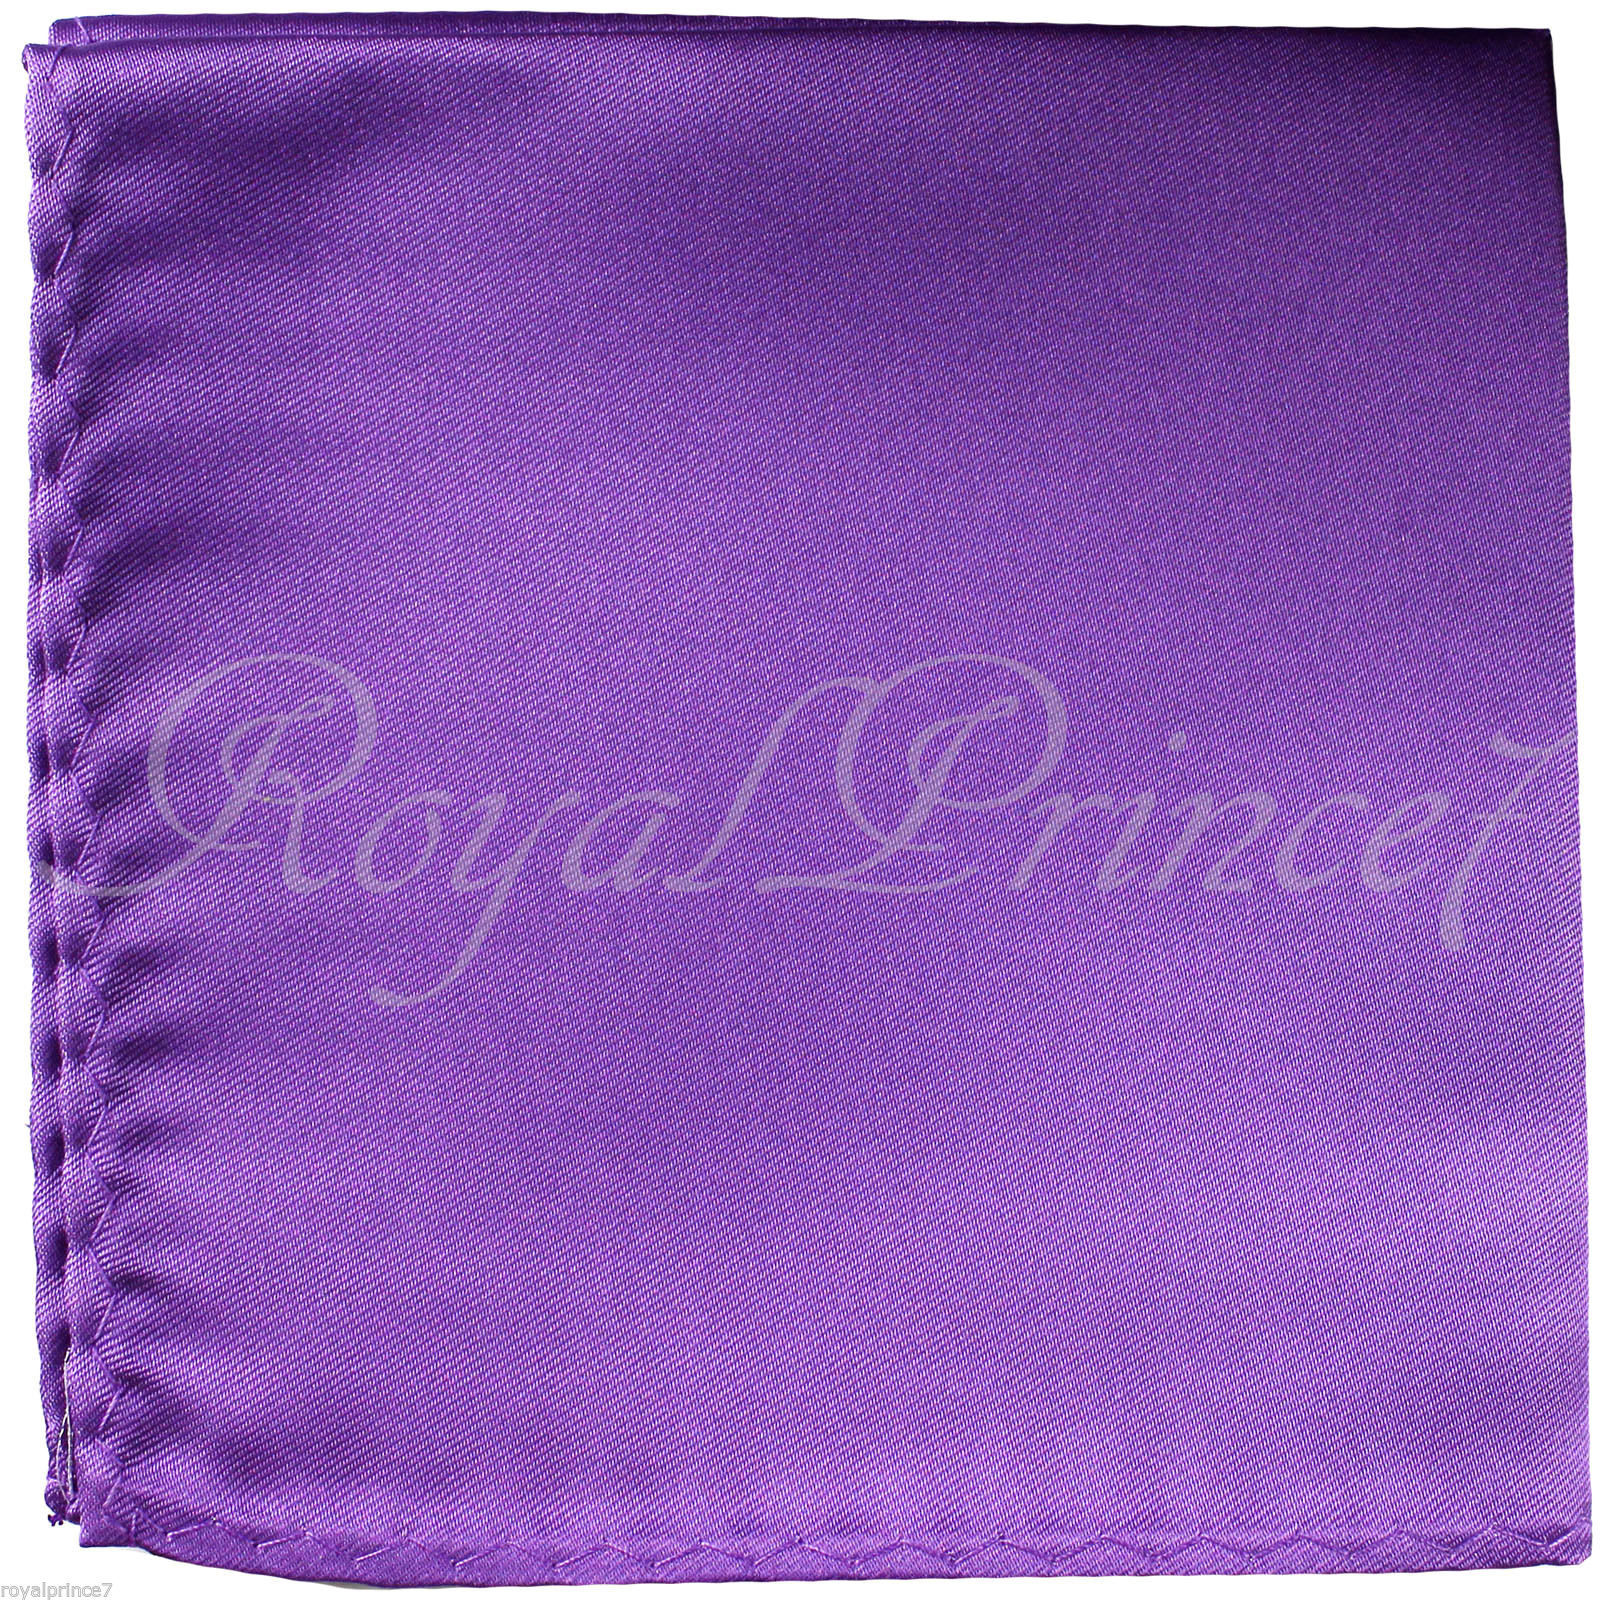 New Men's Lavender Micro Fiber Solid Handkerchief Pocket Square Hanky Wedding